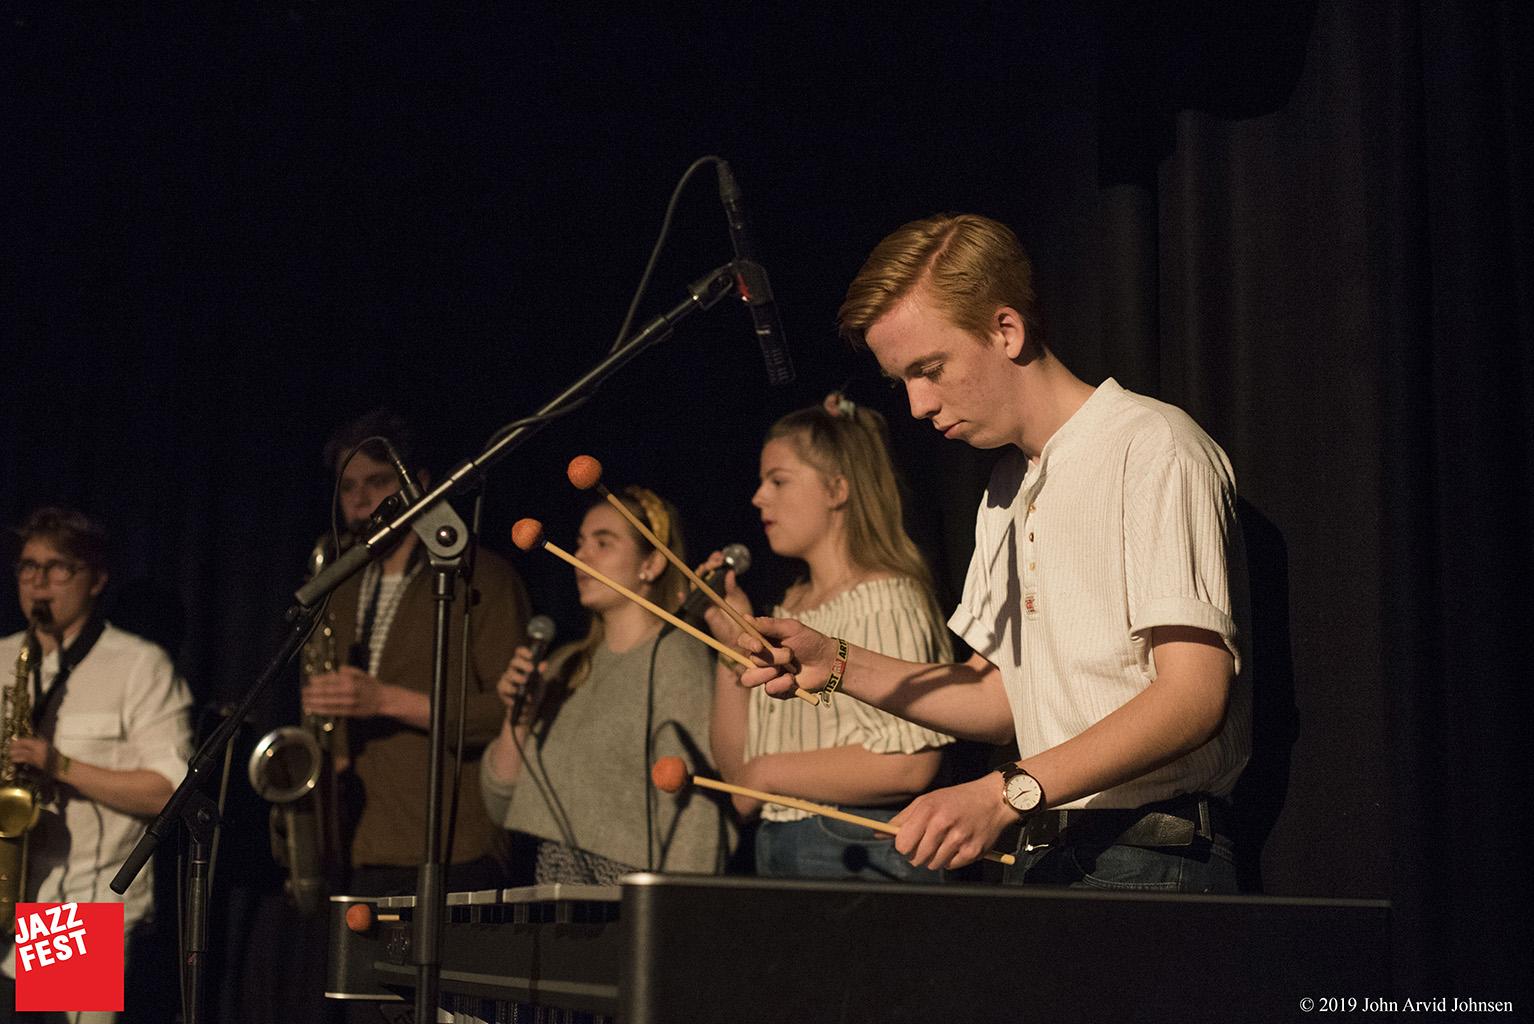 190509 Midtnorsk Ungdomsstorband (Jazzfest Future) @ Byscenen Anneks (foto John Arvid Johnsen) _ 1.jpg